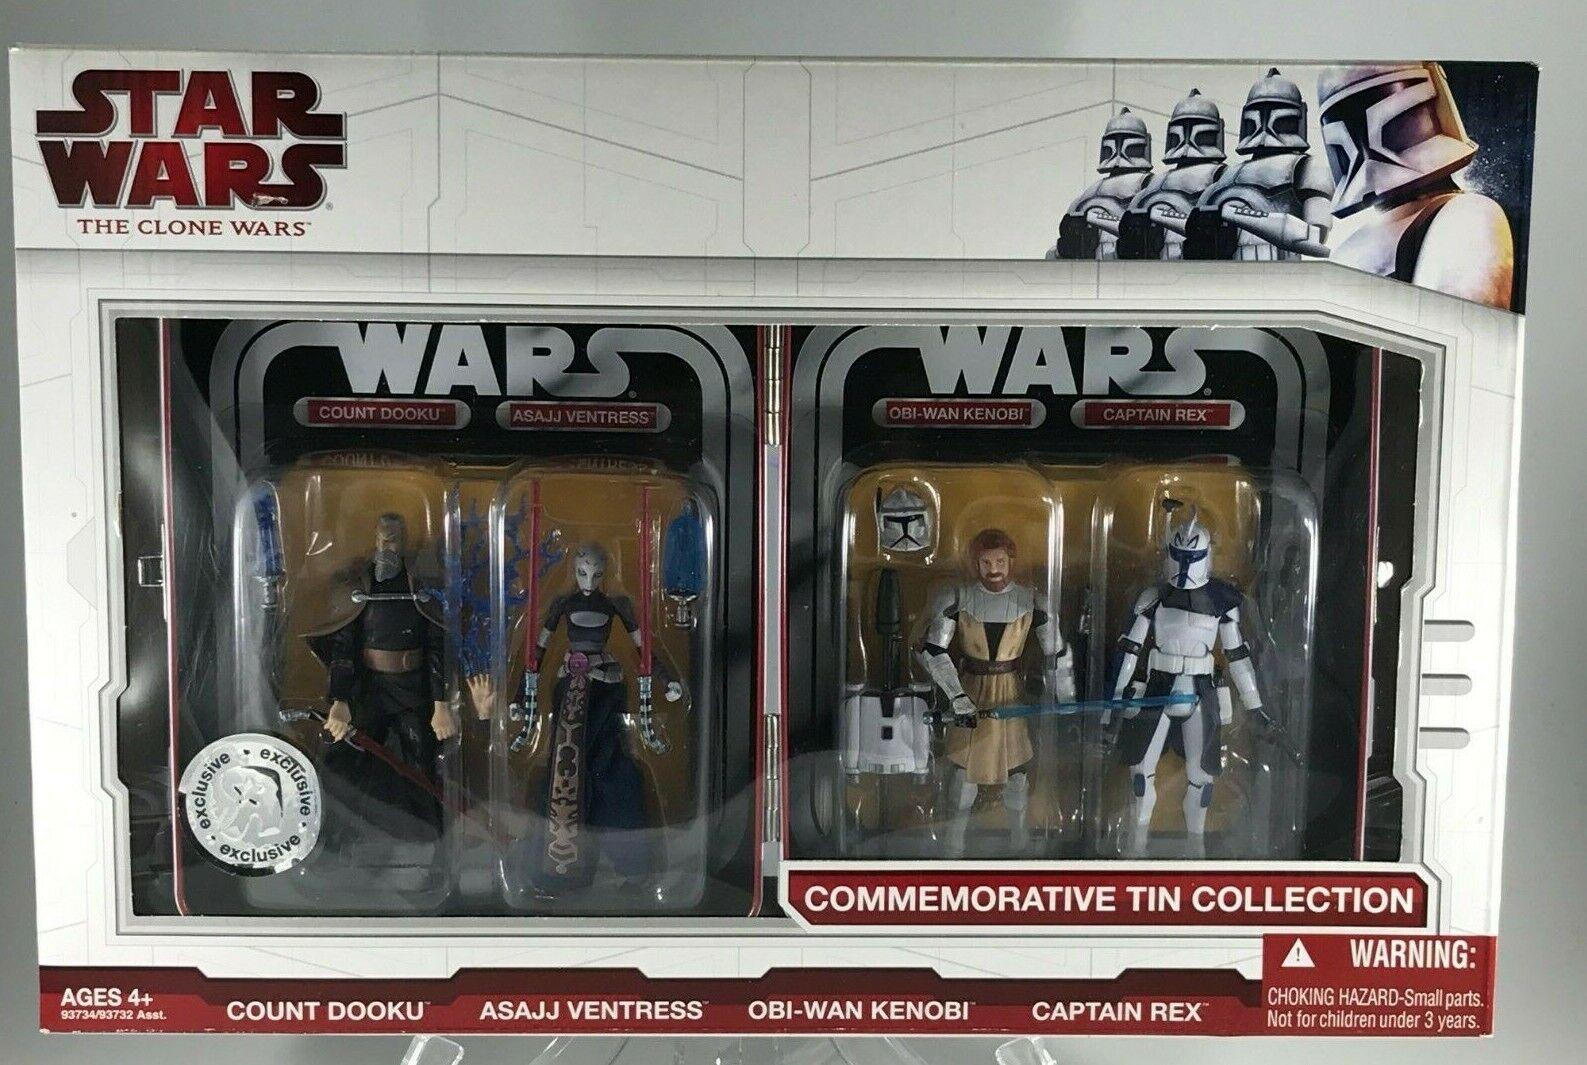 estrella guerras Clone guerras TRU Exclusive Tin collezione Set ObiWan Rex Dooku Ventress